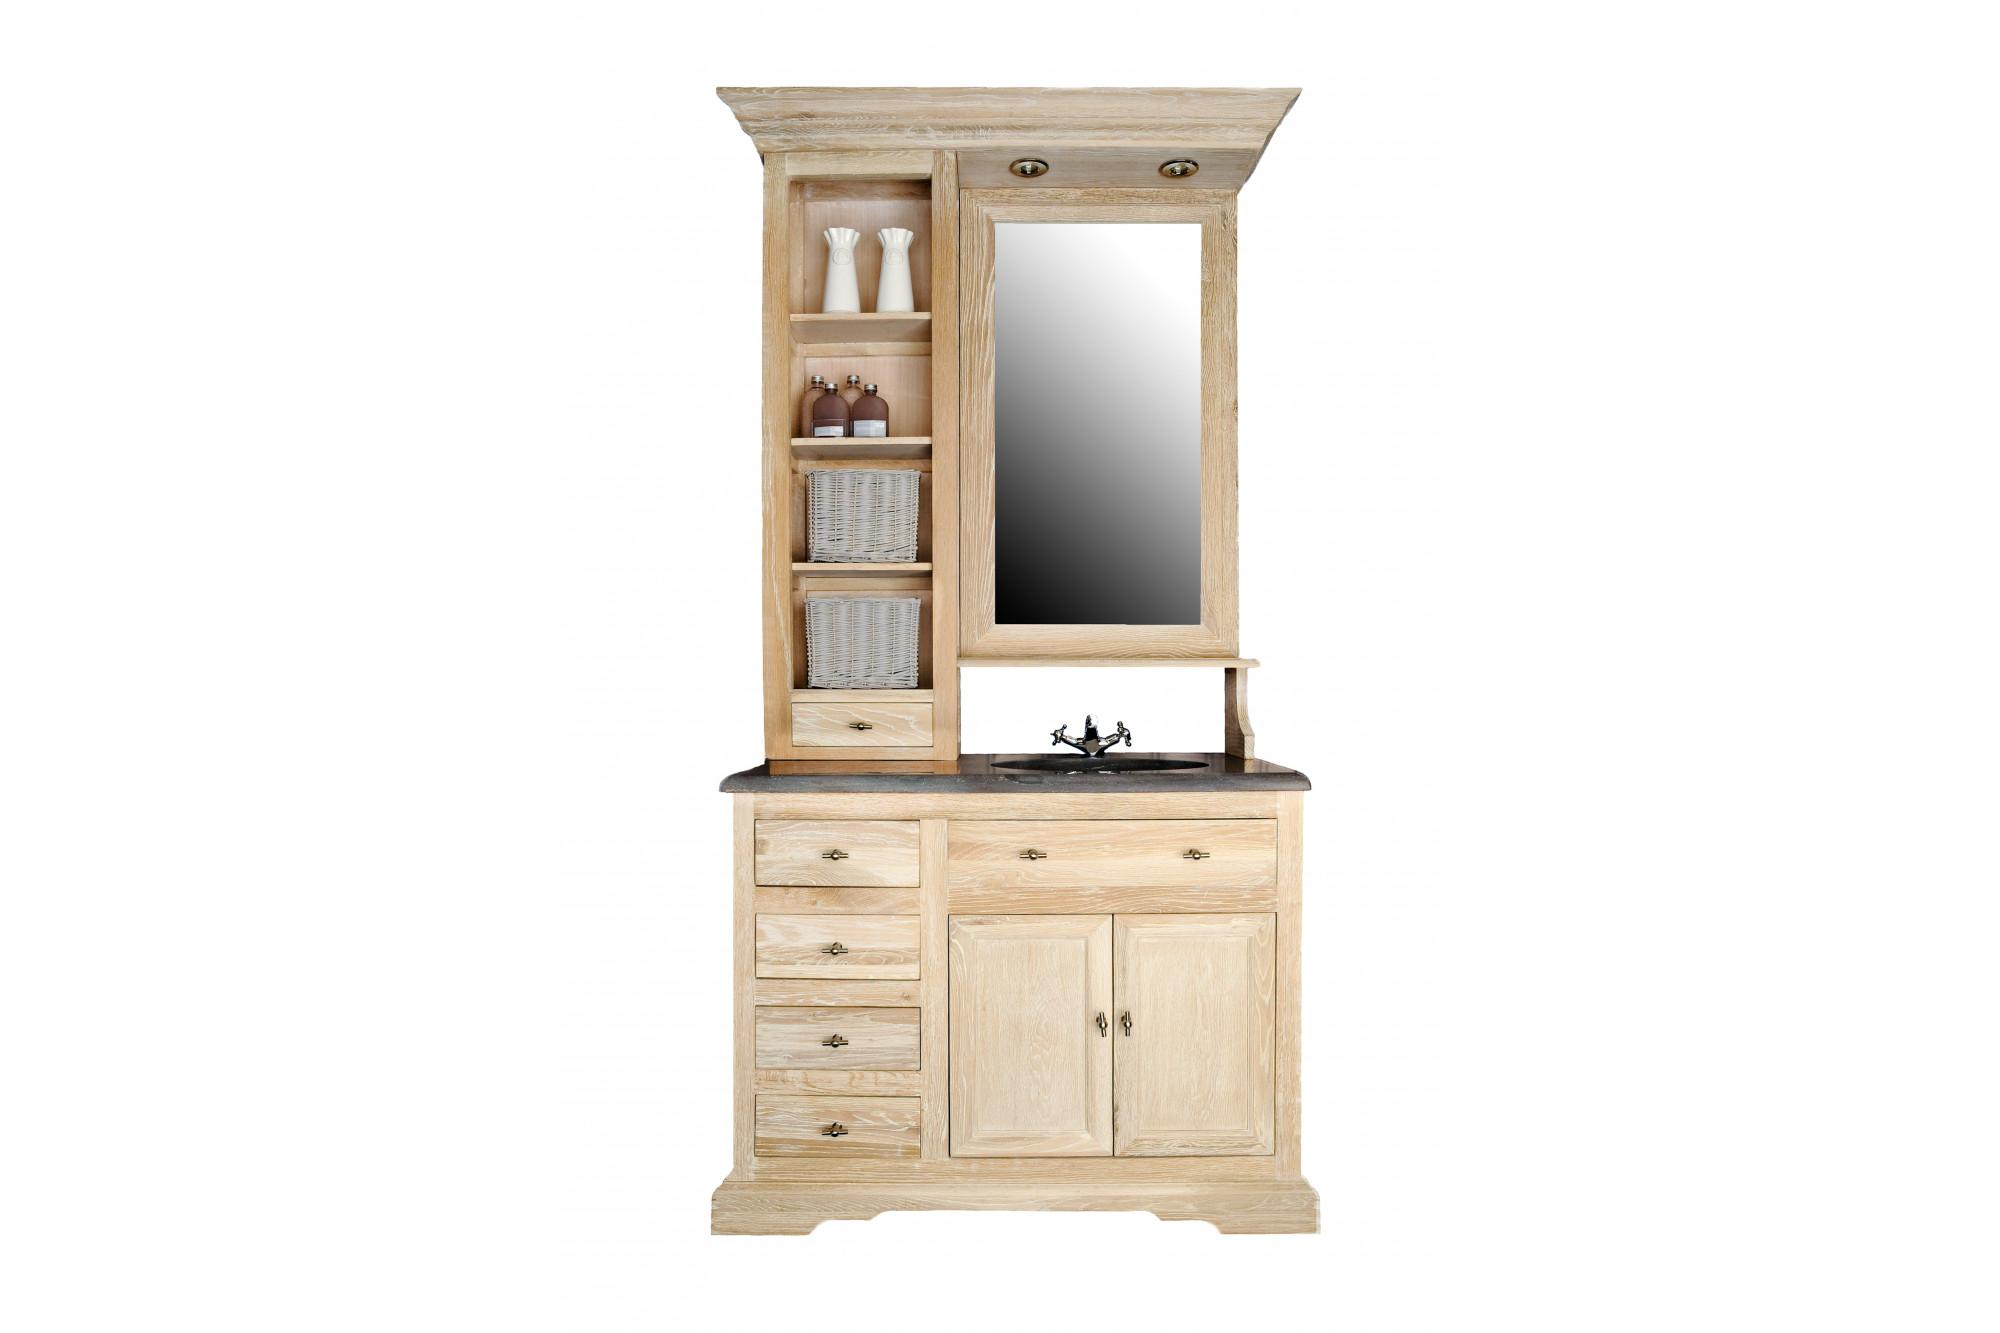 Meuble Haut Salle De Bain Avec Miroir meuble de salle de bain en chêne blanchi avec vasque, éclairage et miroir -  hellin